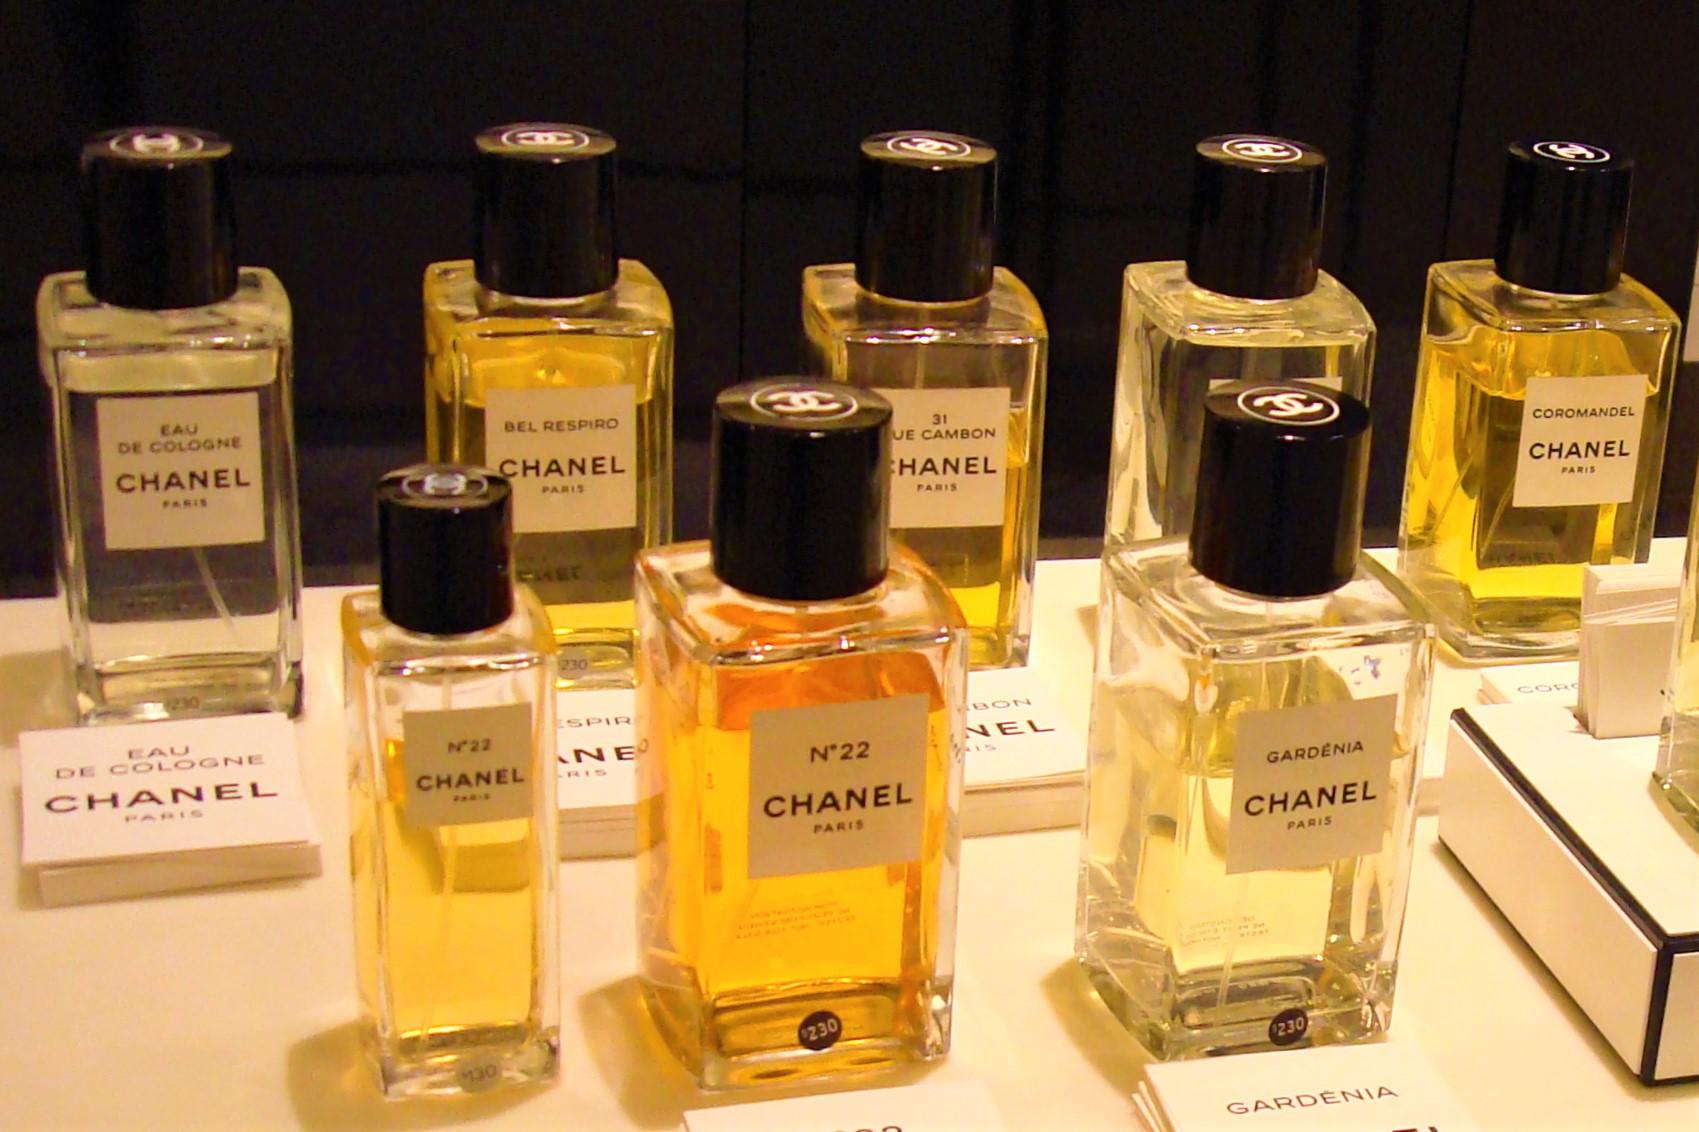 парфюм оптом по низким ценам